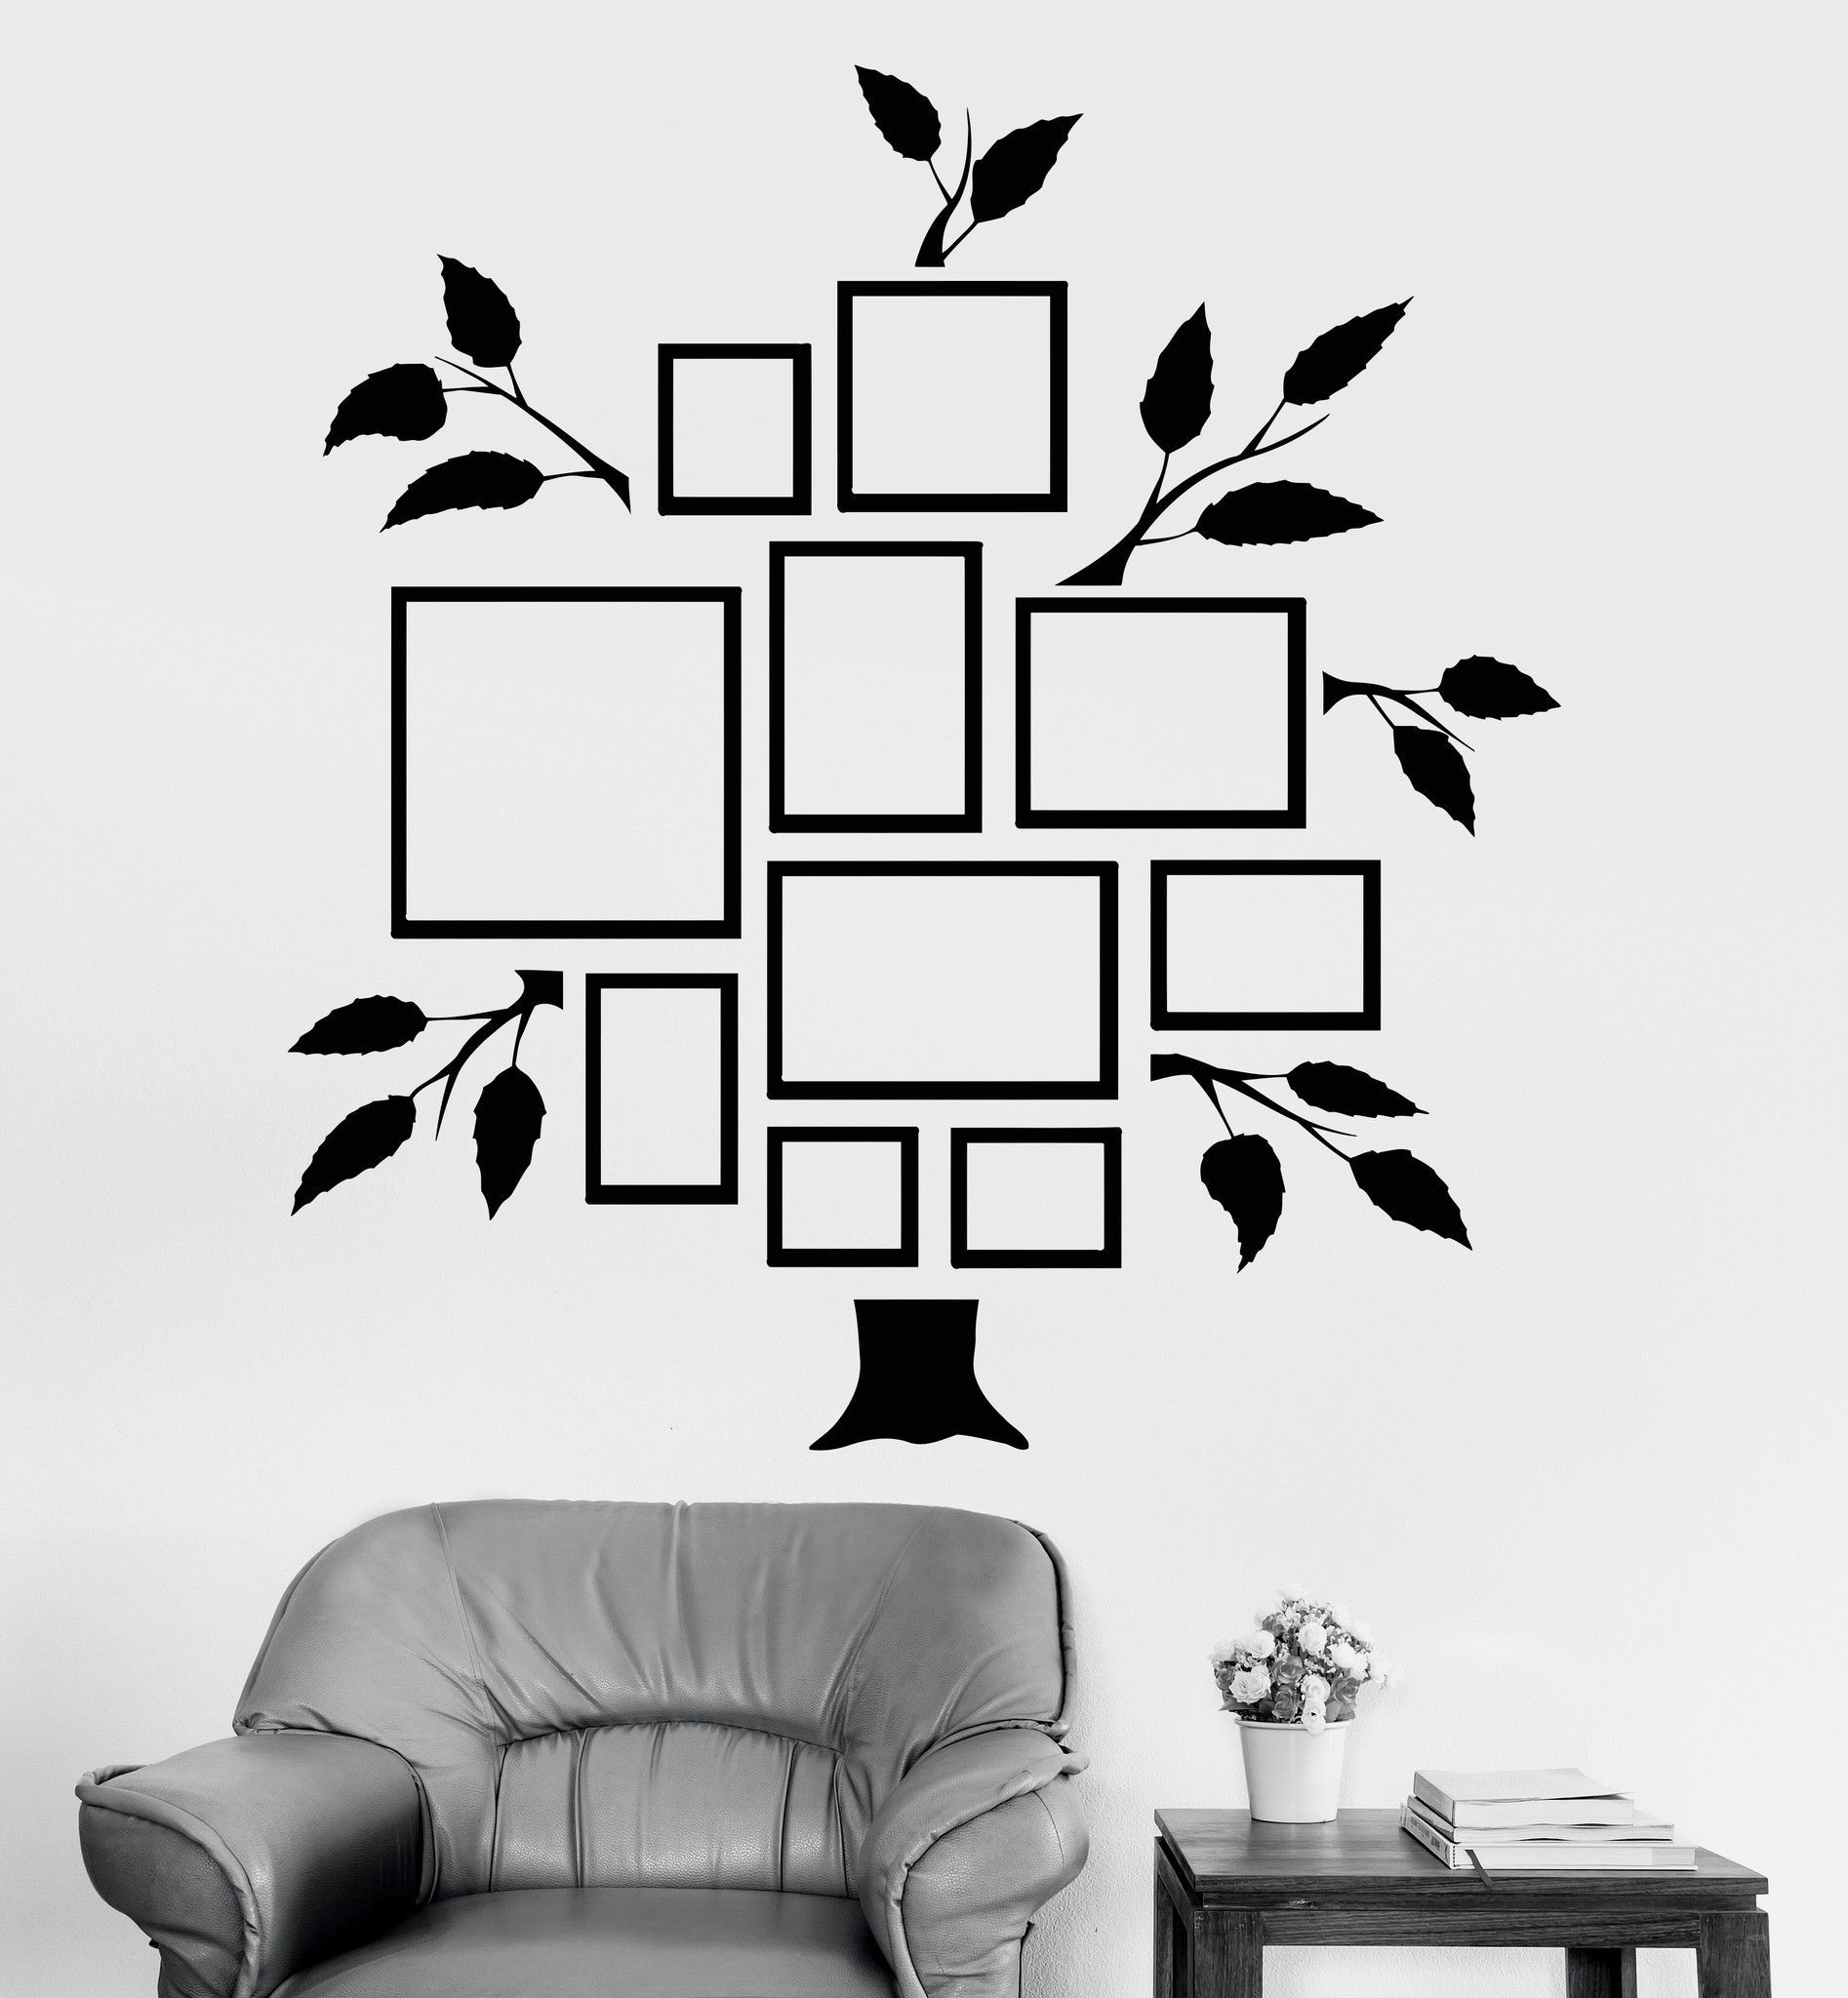 Vinyl Wall Decal Family Tree Frames For Photos Design For Living - Vinyl stickers design